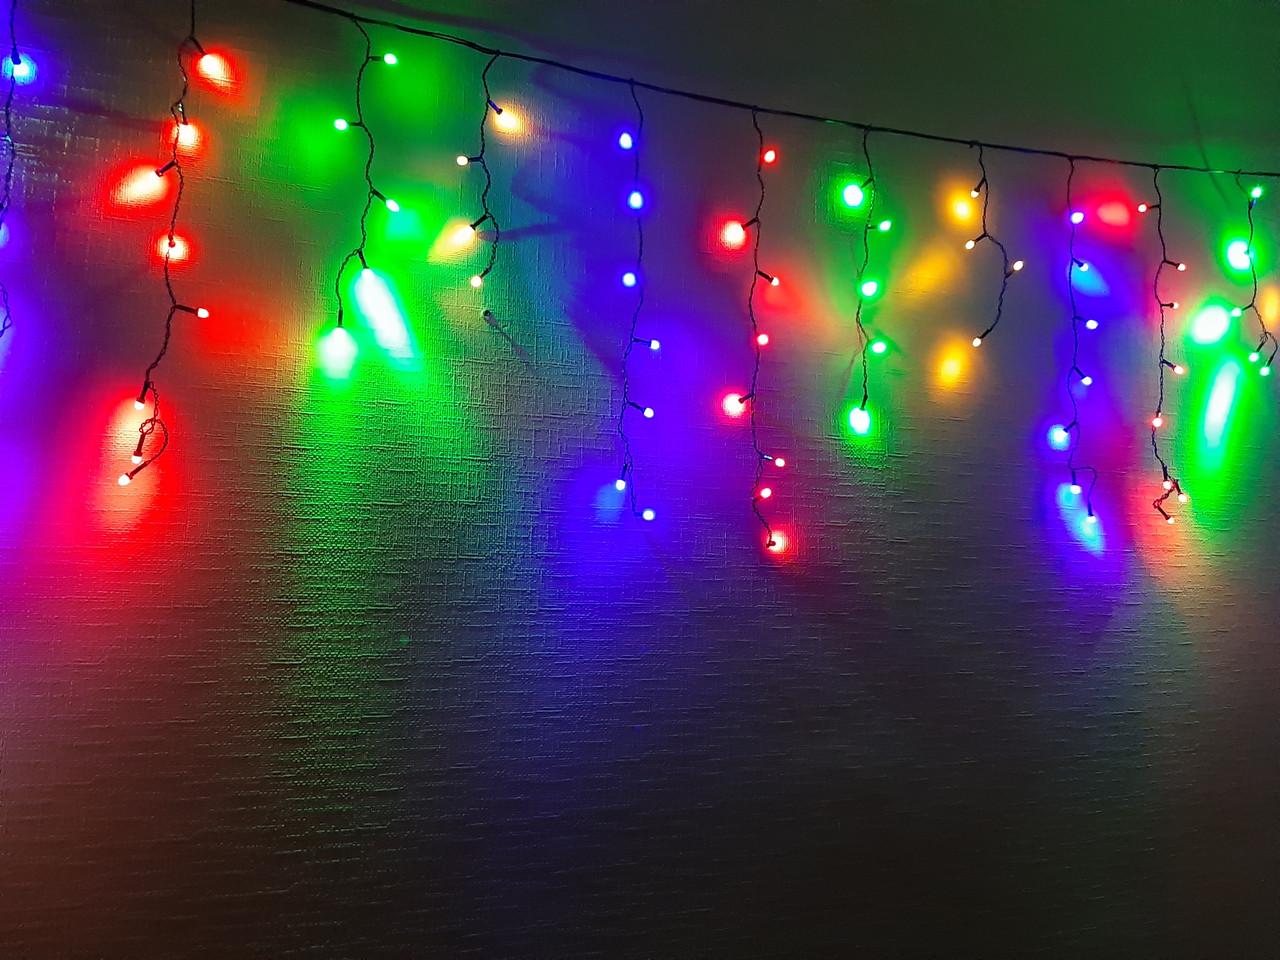 Гирлянда светодиодная Бахрома 3х0,6м, 144led Разноцветная ( гирлянда на окно мультик )